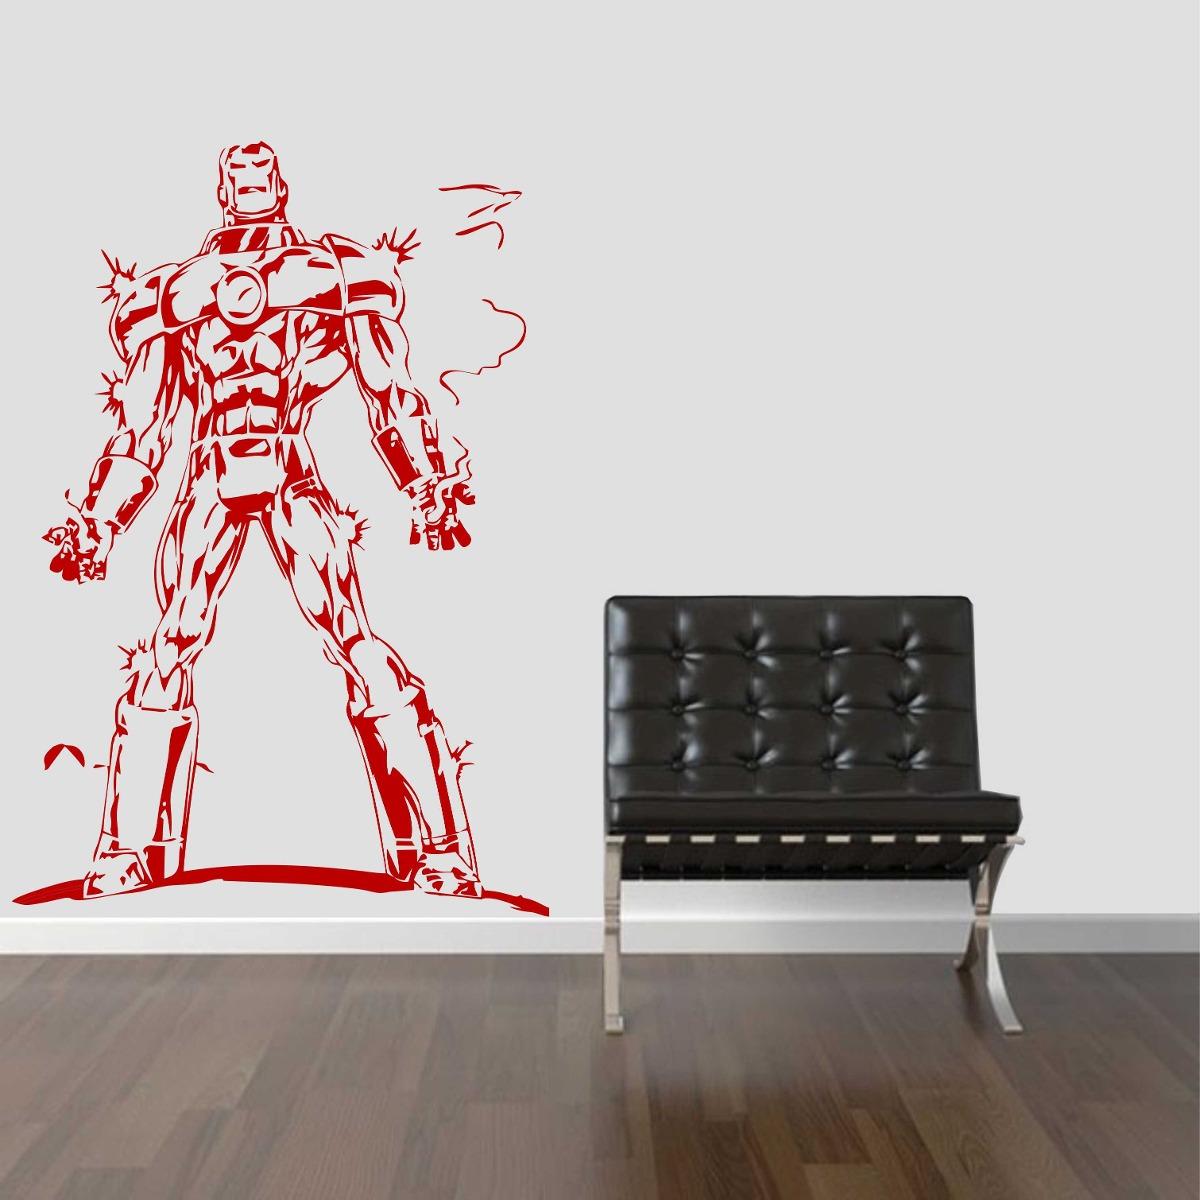 Como Conseguir Adesivo De Idoso ~ Adesivo Parede Super Herói Homem De Ferro Os Vingadores R$ 29,99 no MercadoLivre